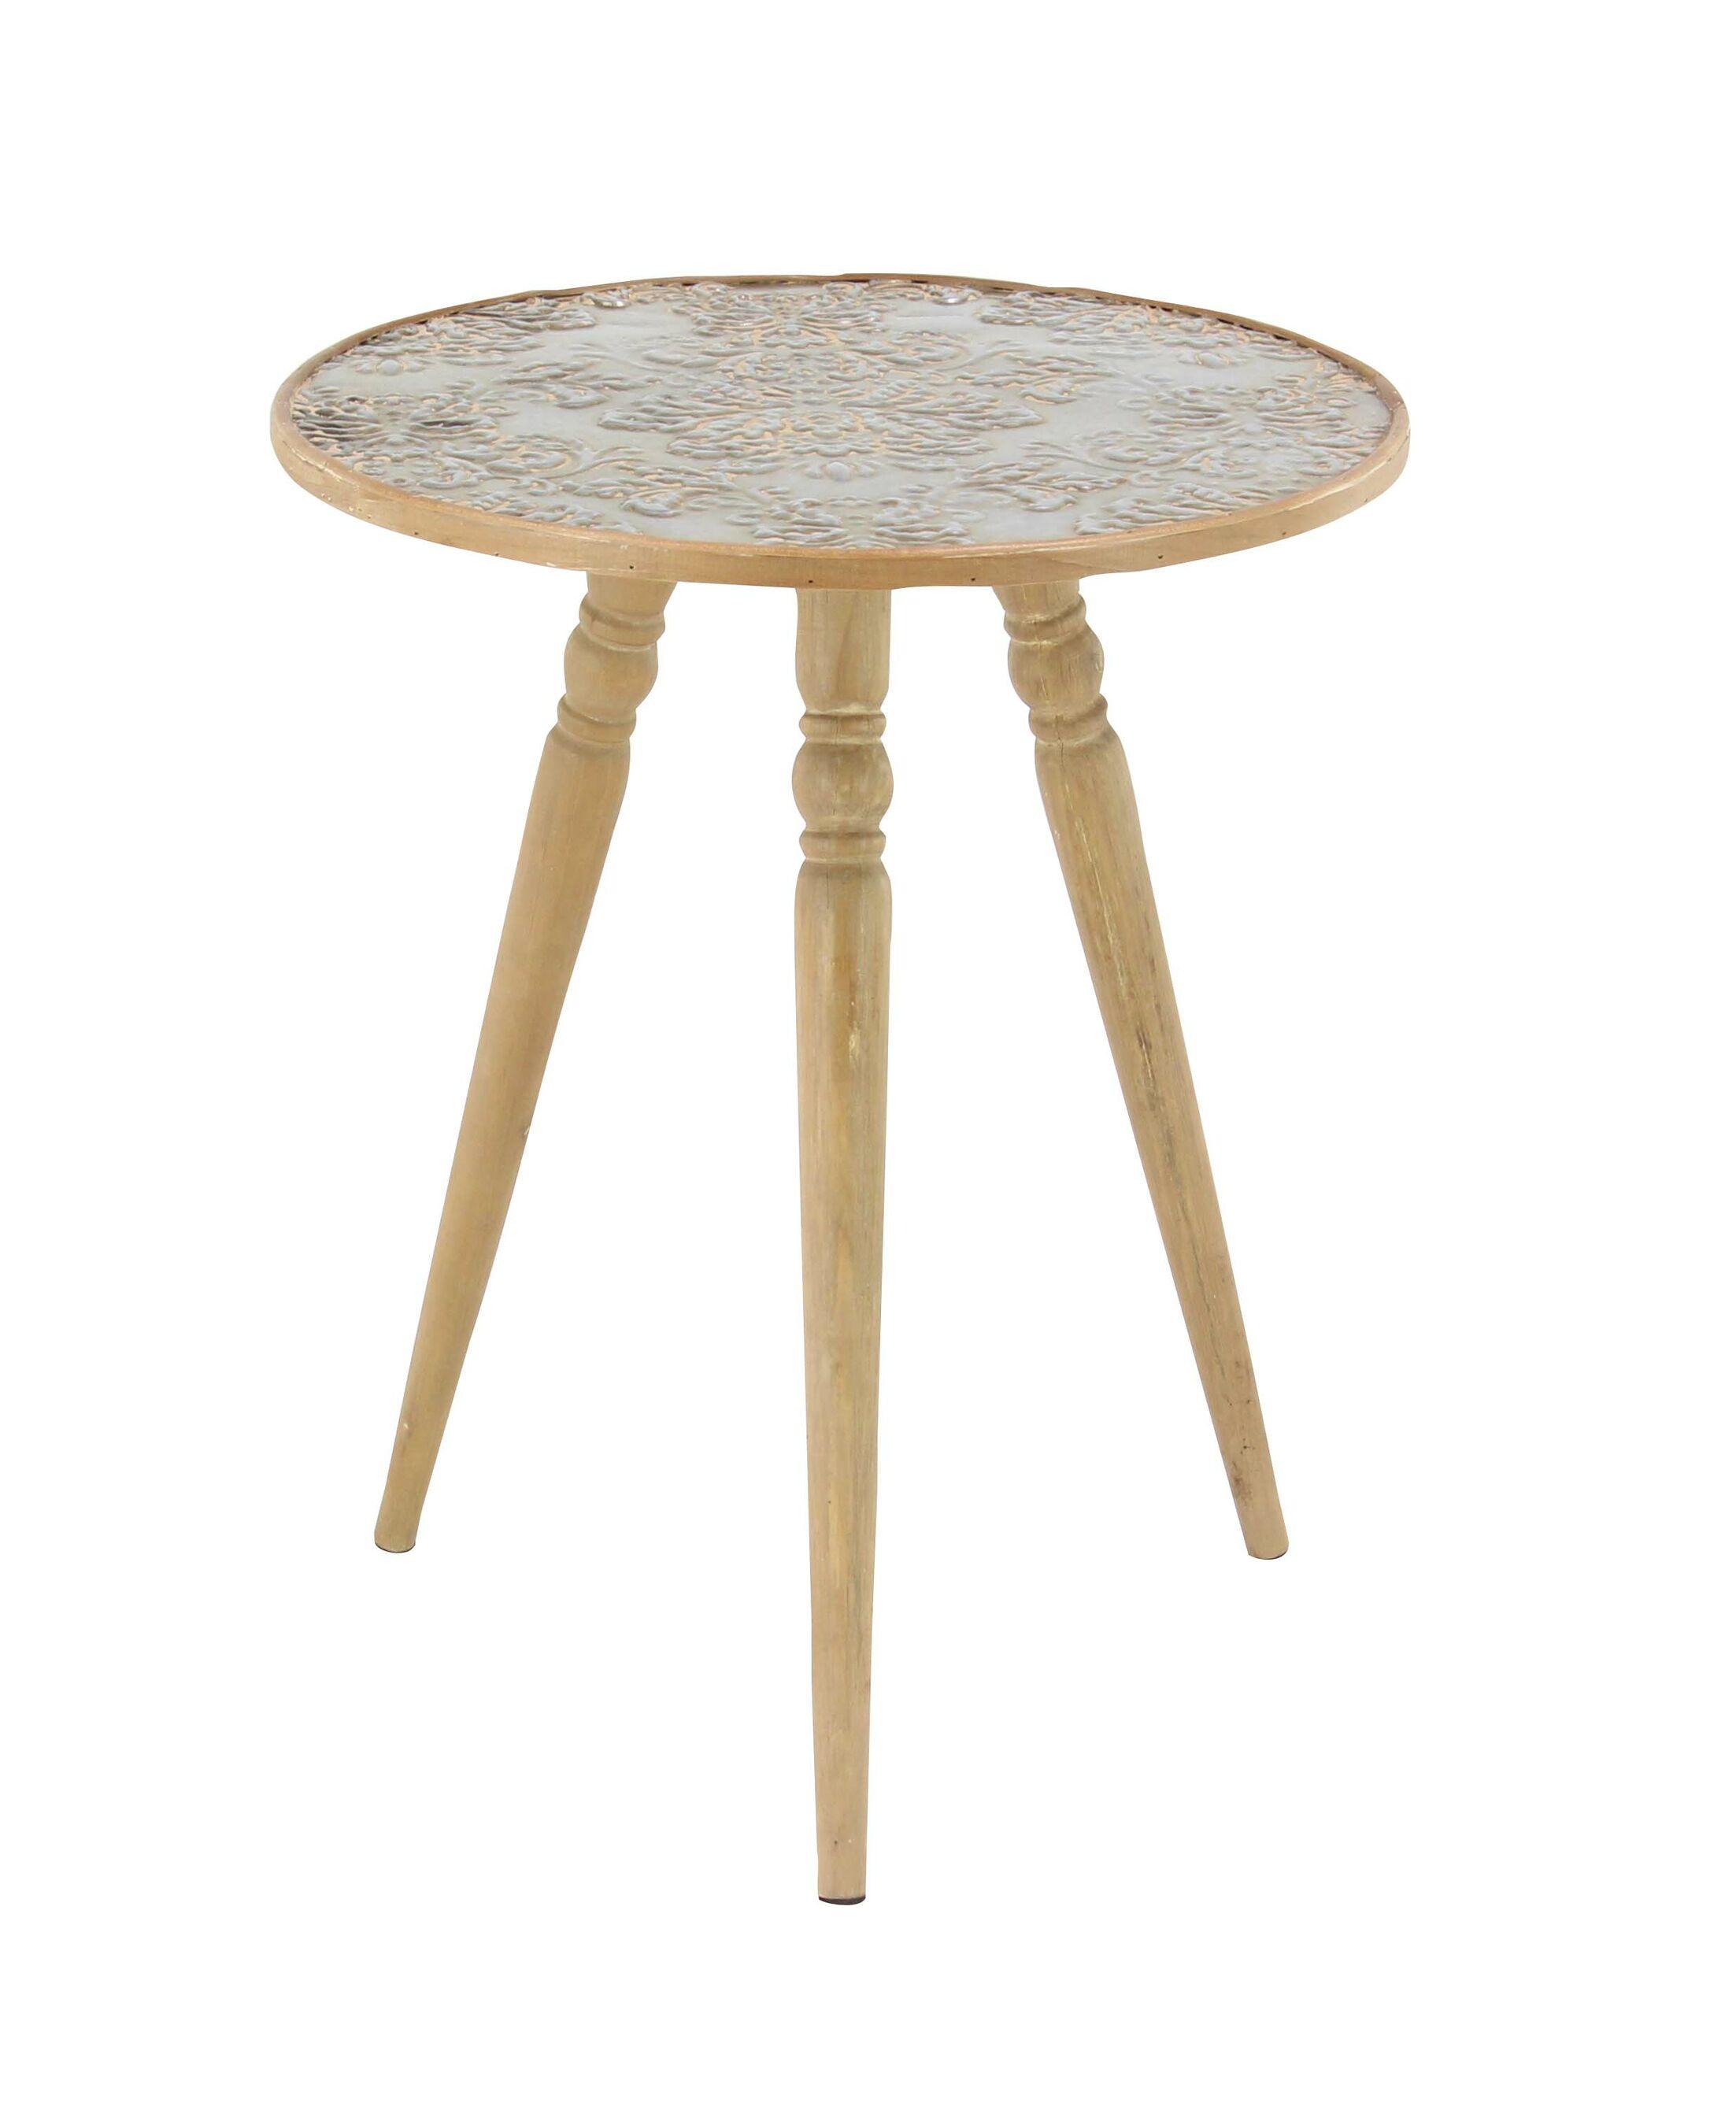 Hanagita Tripod End Table